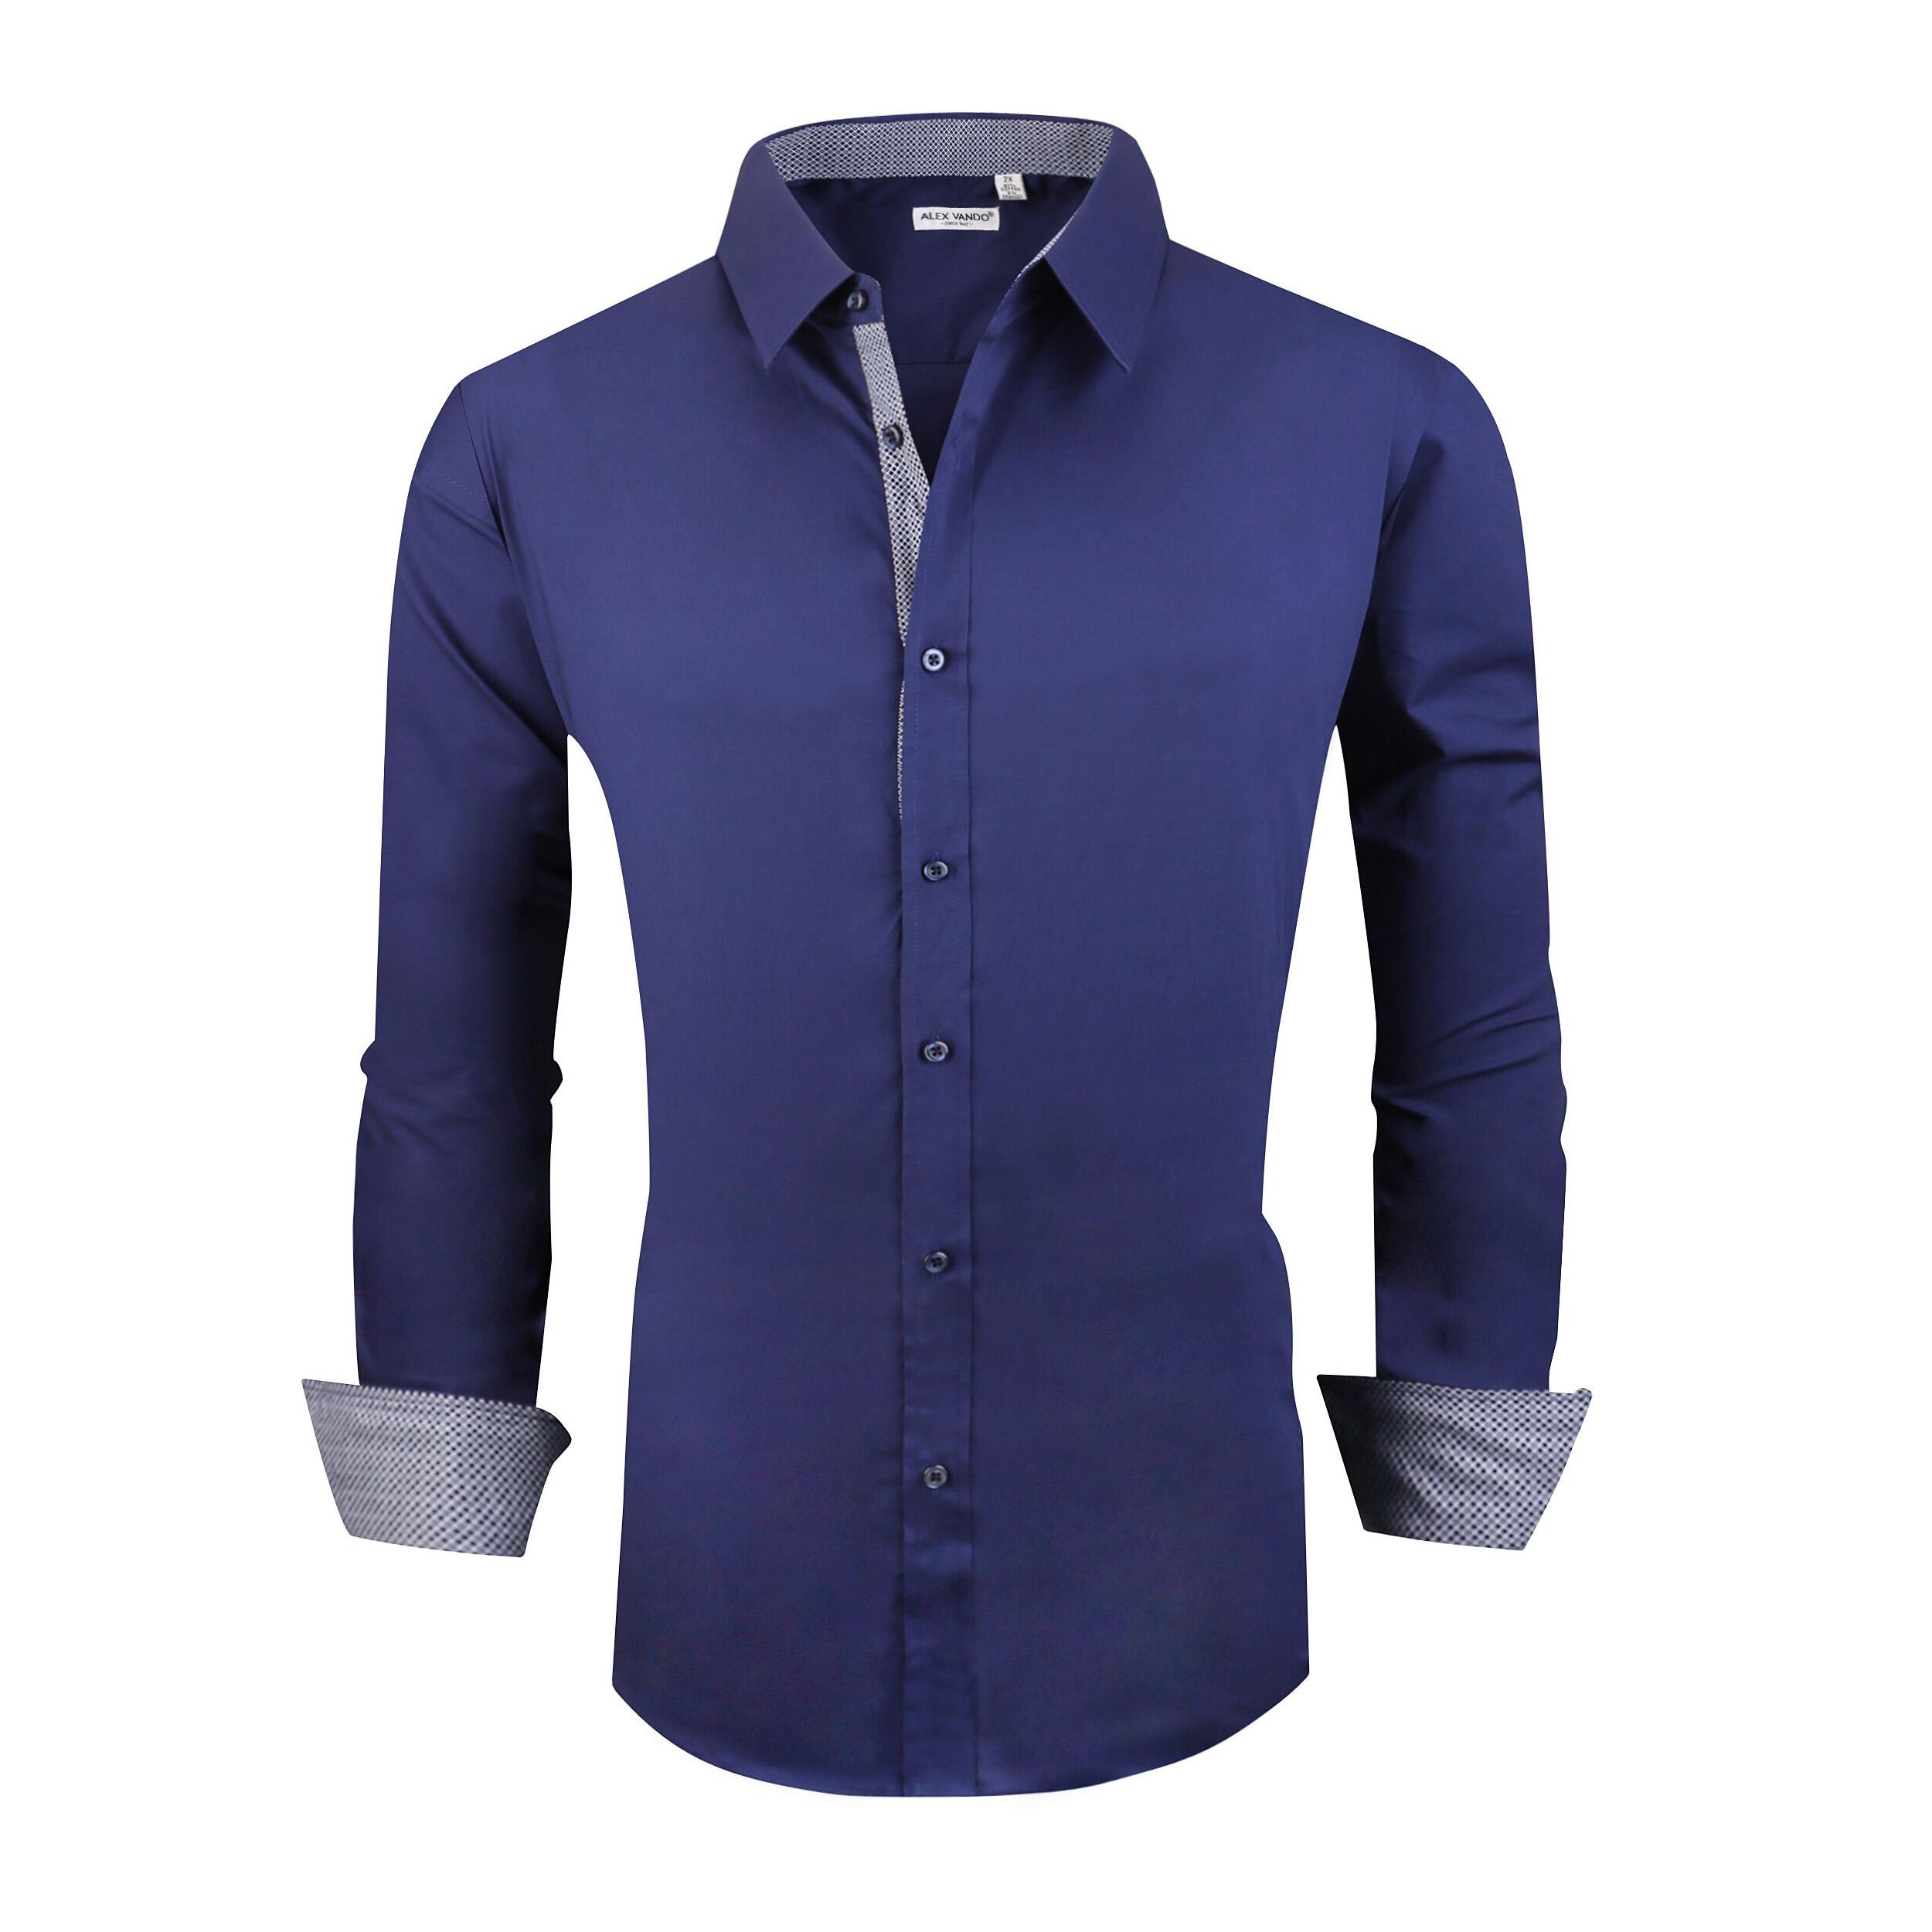 d96275f852d Alex Vando Mens Big & Tall Dress Shirts Regular Fit Long Sleeve Men Shirt  Navy